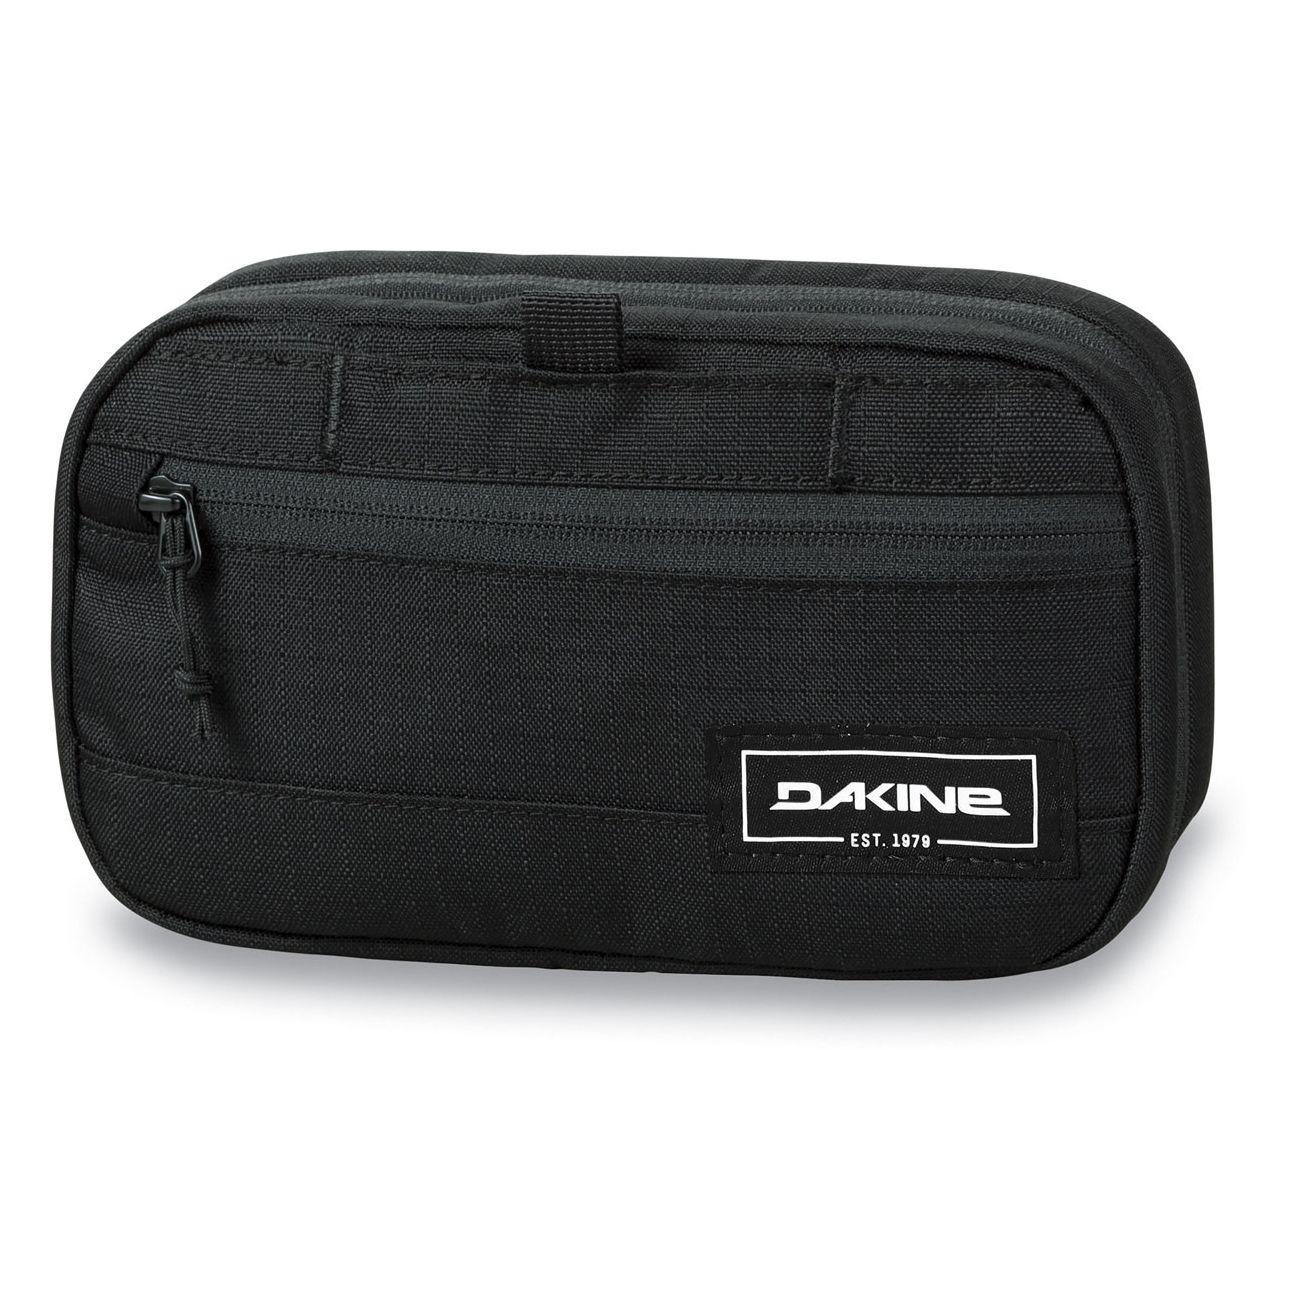 Dakine Shower Kit S